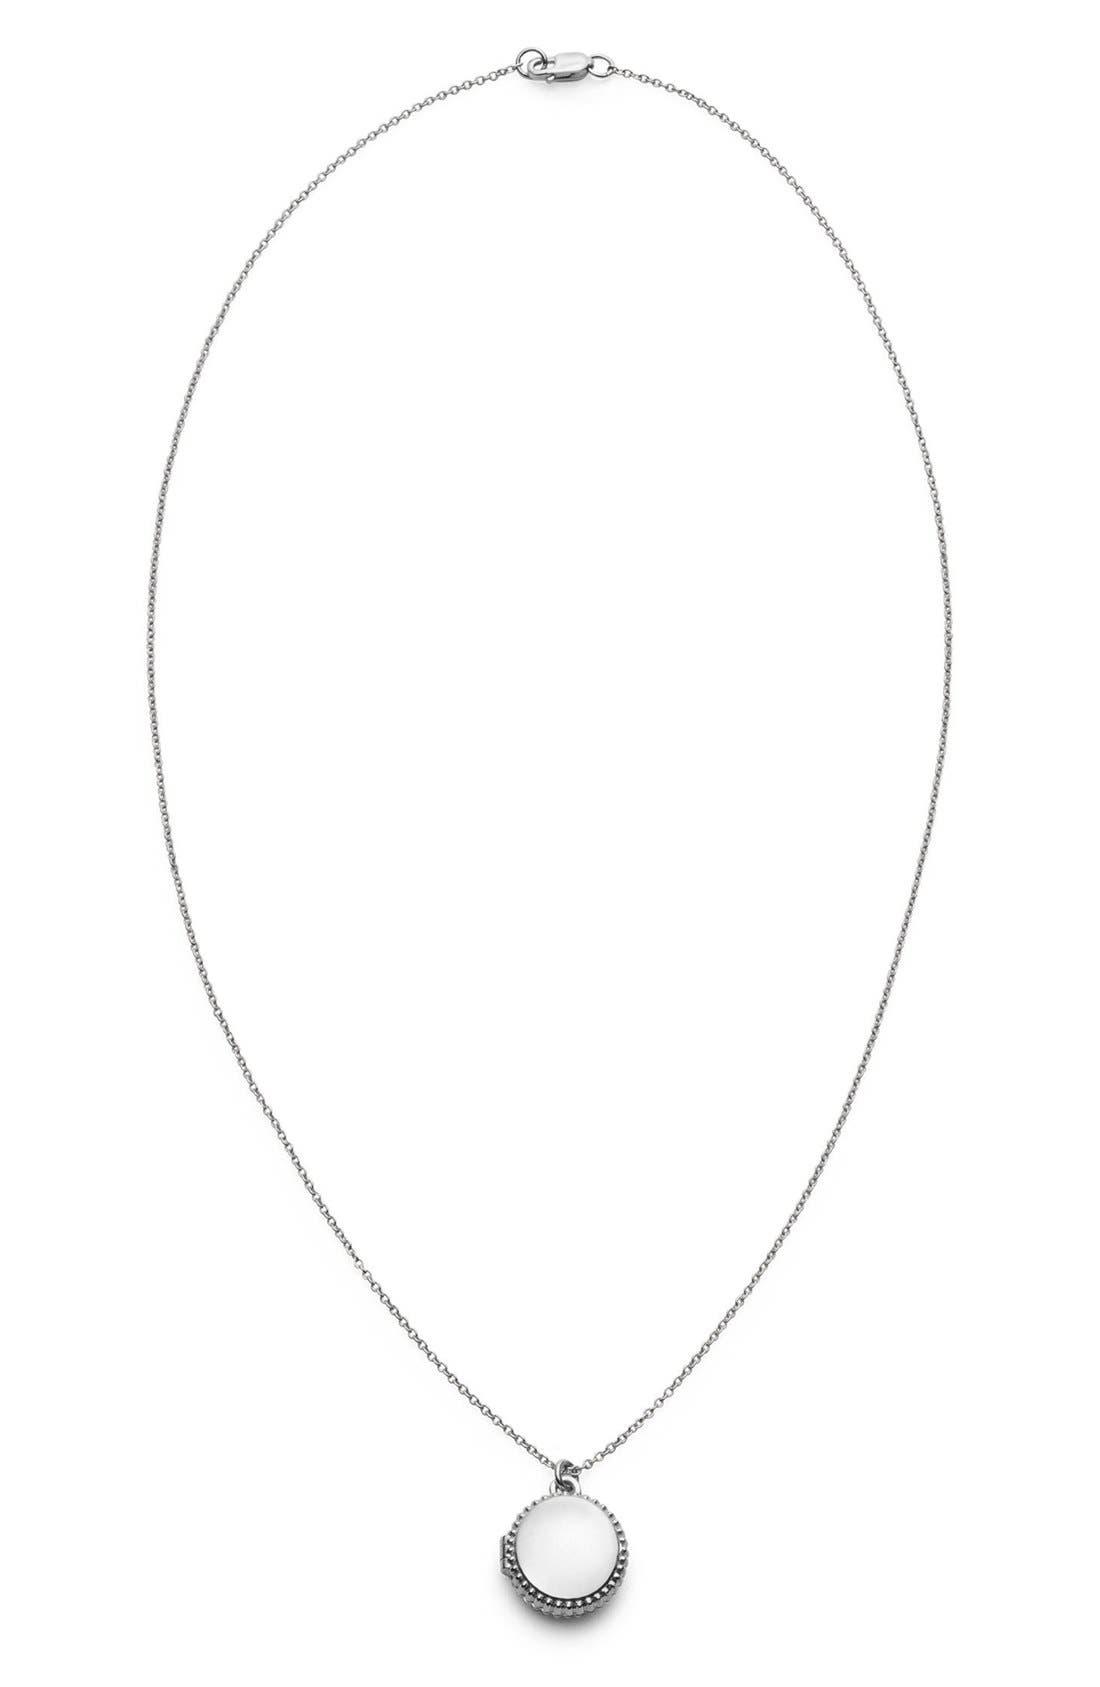 Coin Edge Locket Necklace,                             Main thumbnail 1, color,                             040